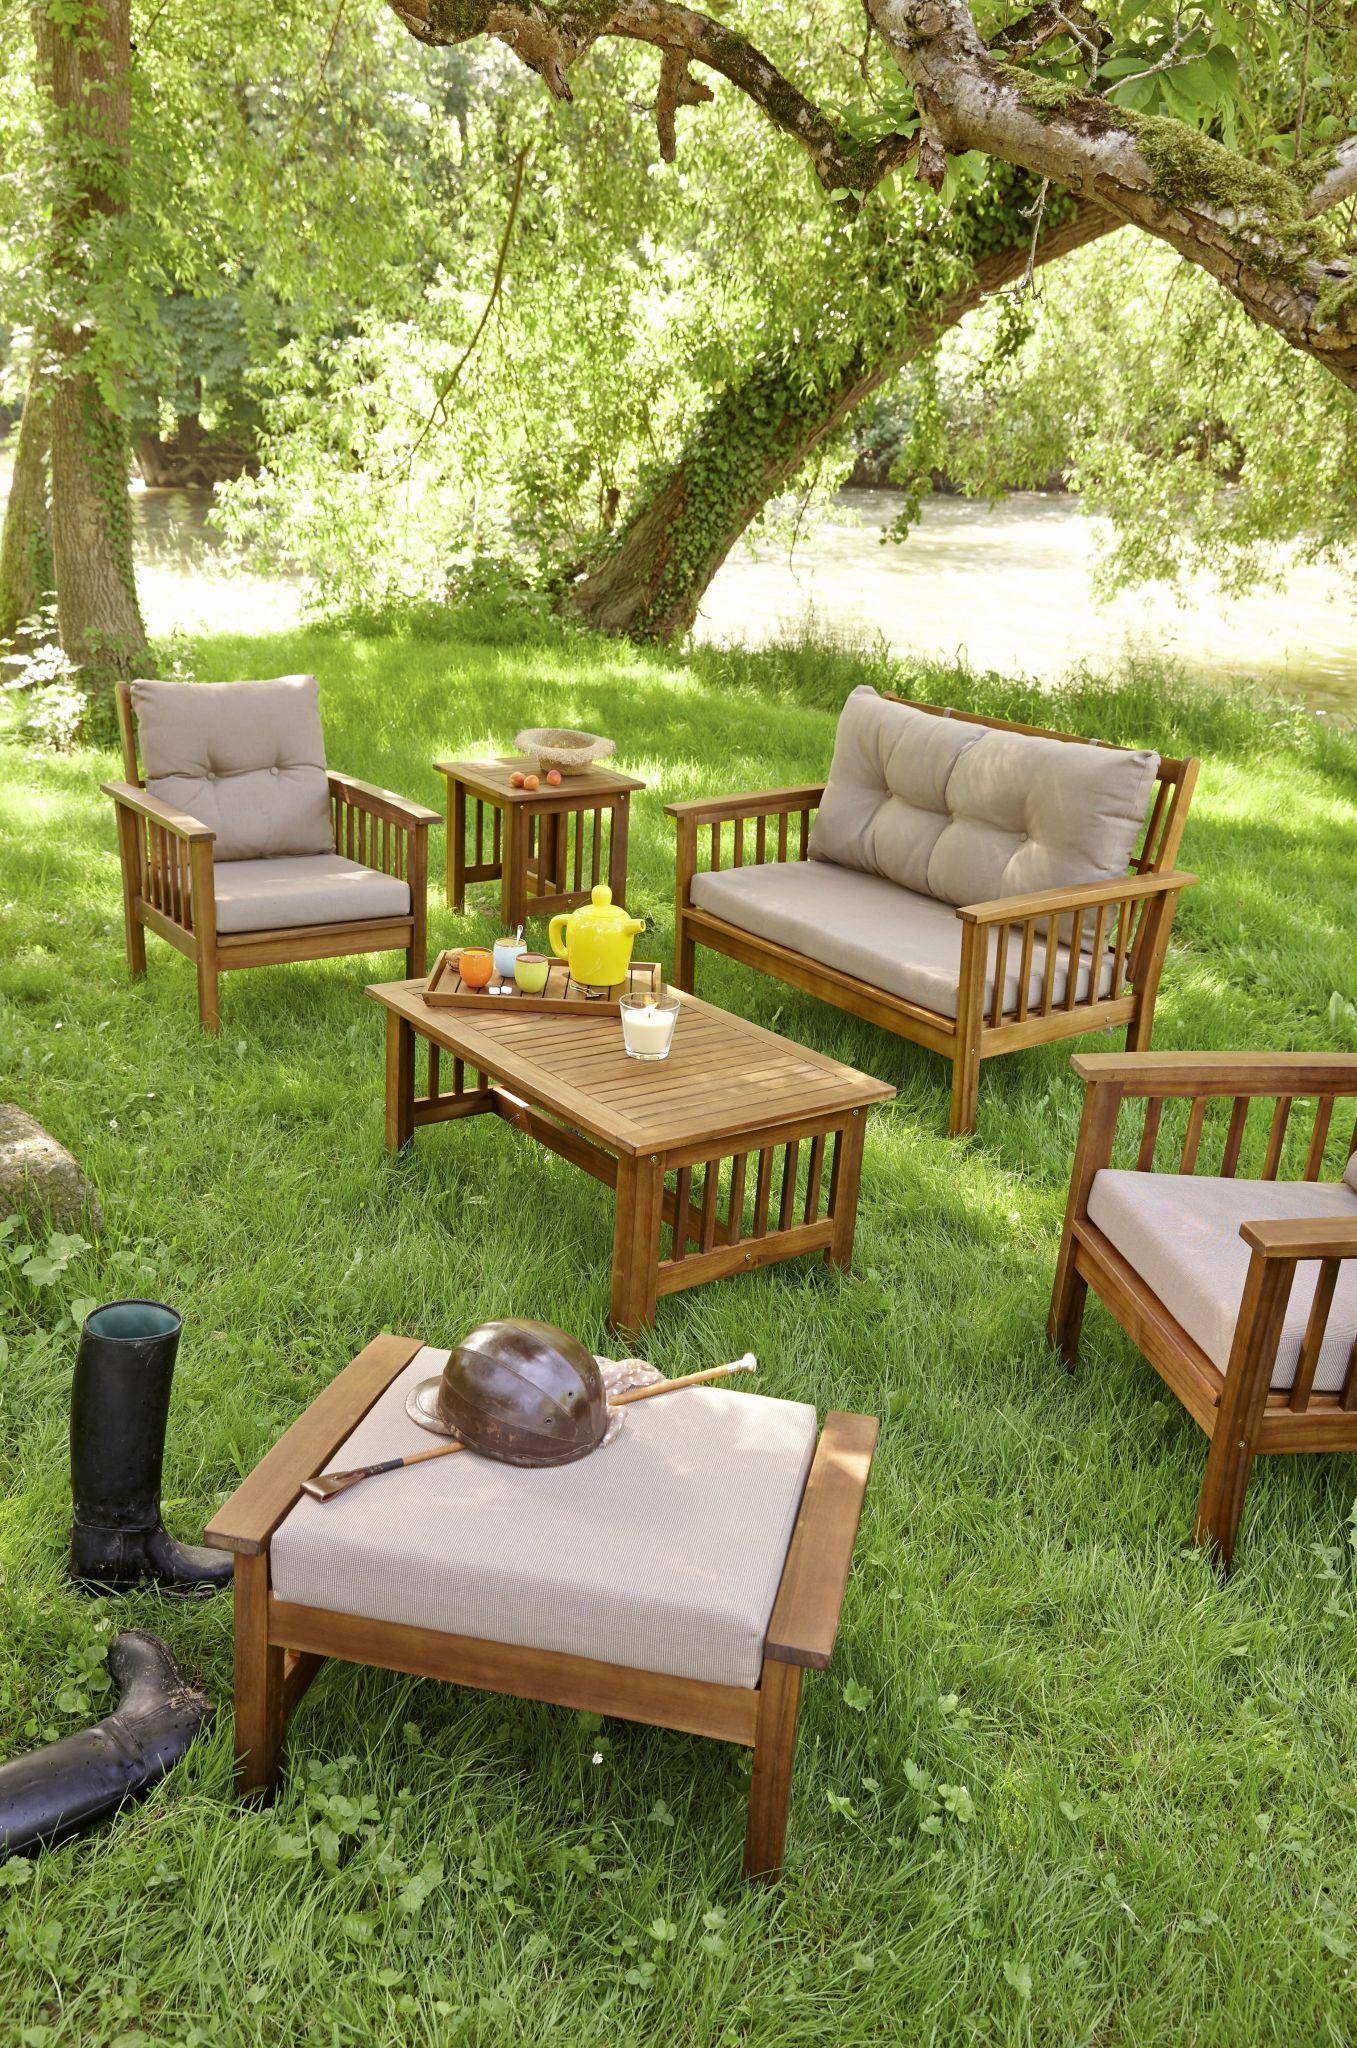 Salon De Jardin En Palette Génial Table Jardin Teck Luxe ... serapportantà Table Jardin Bois